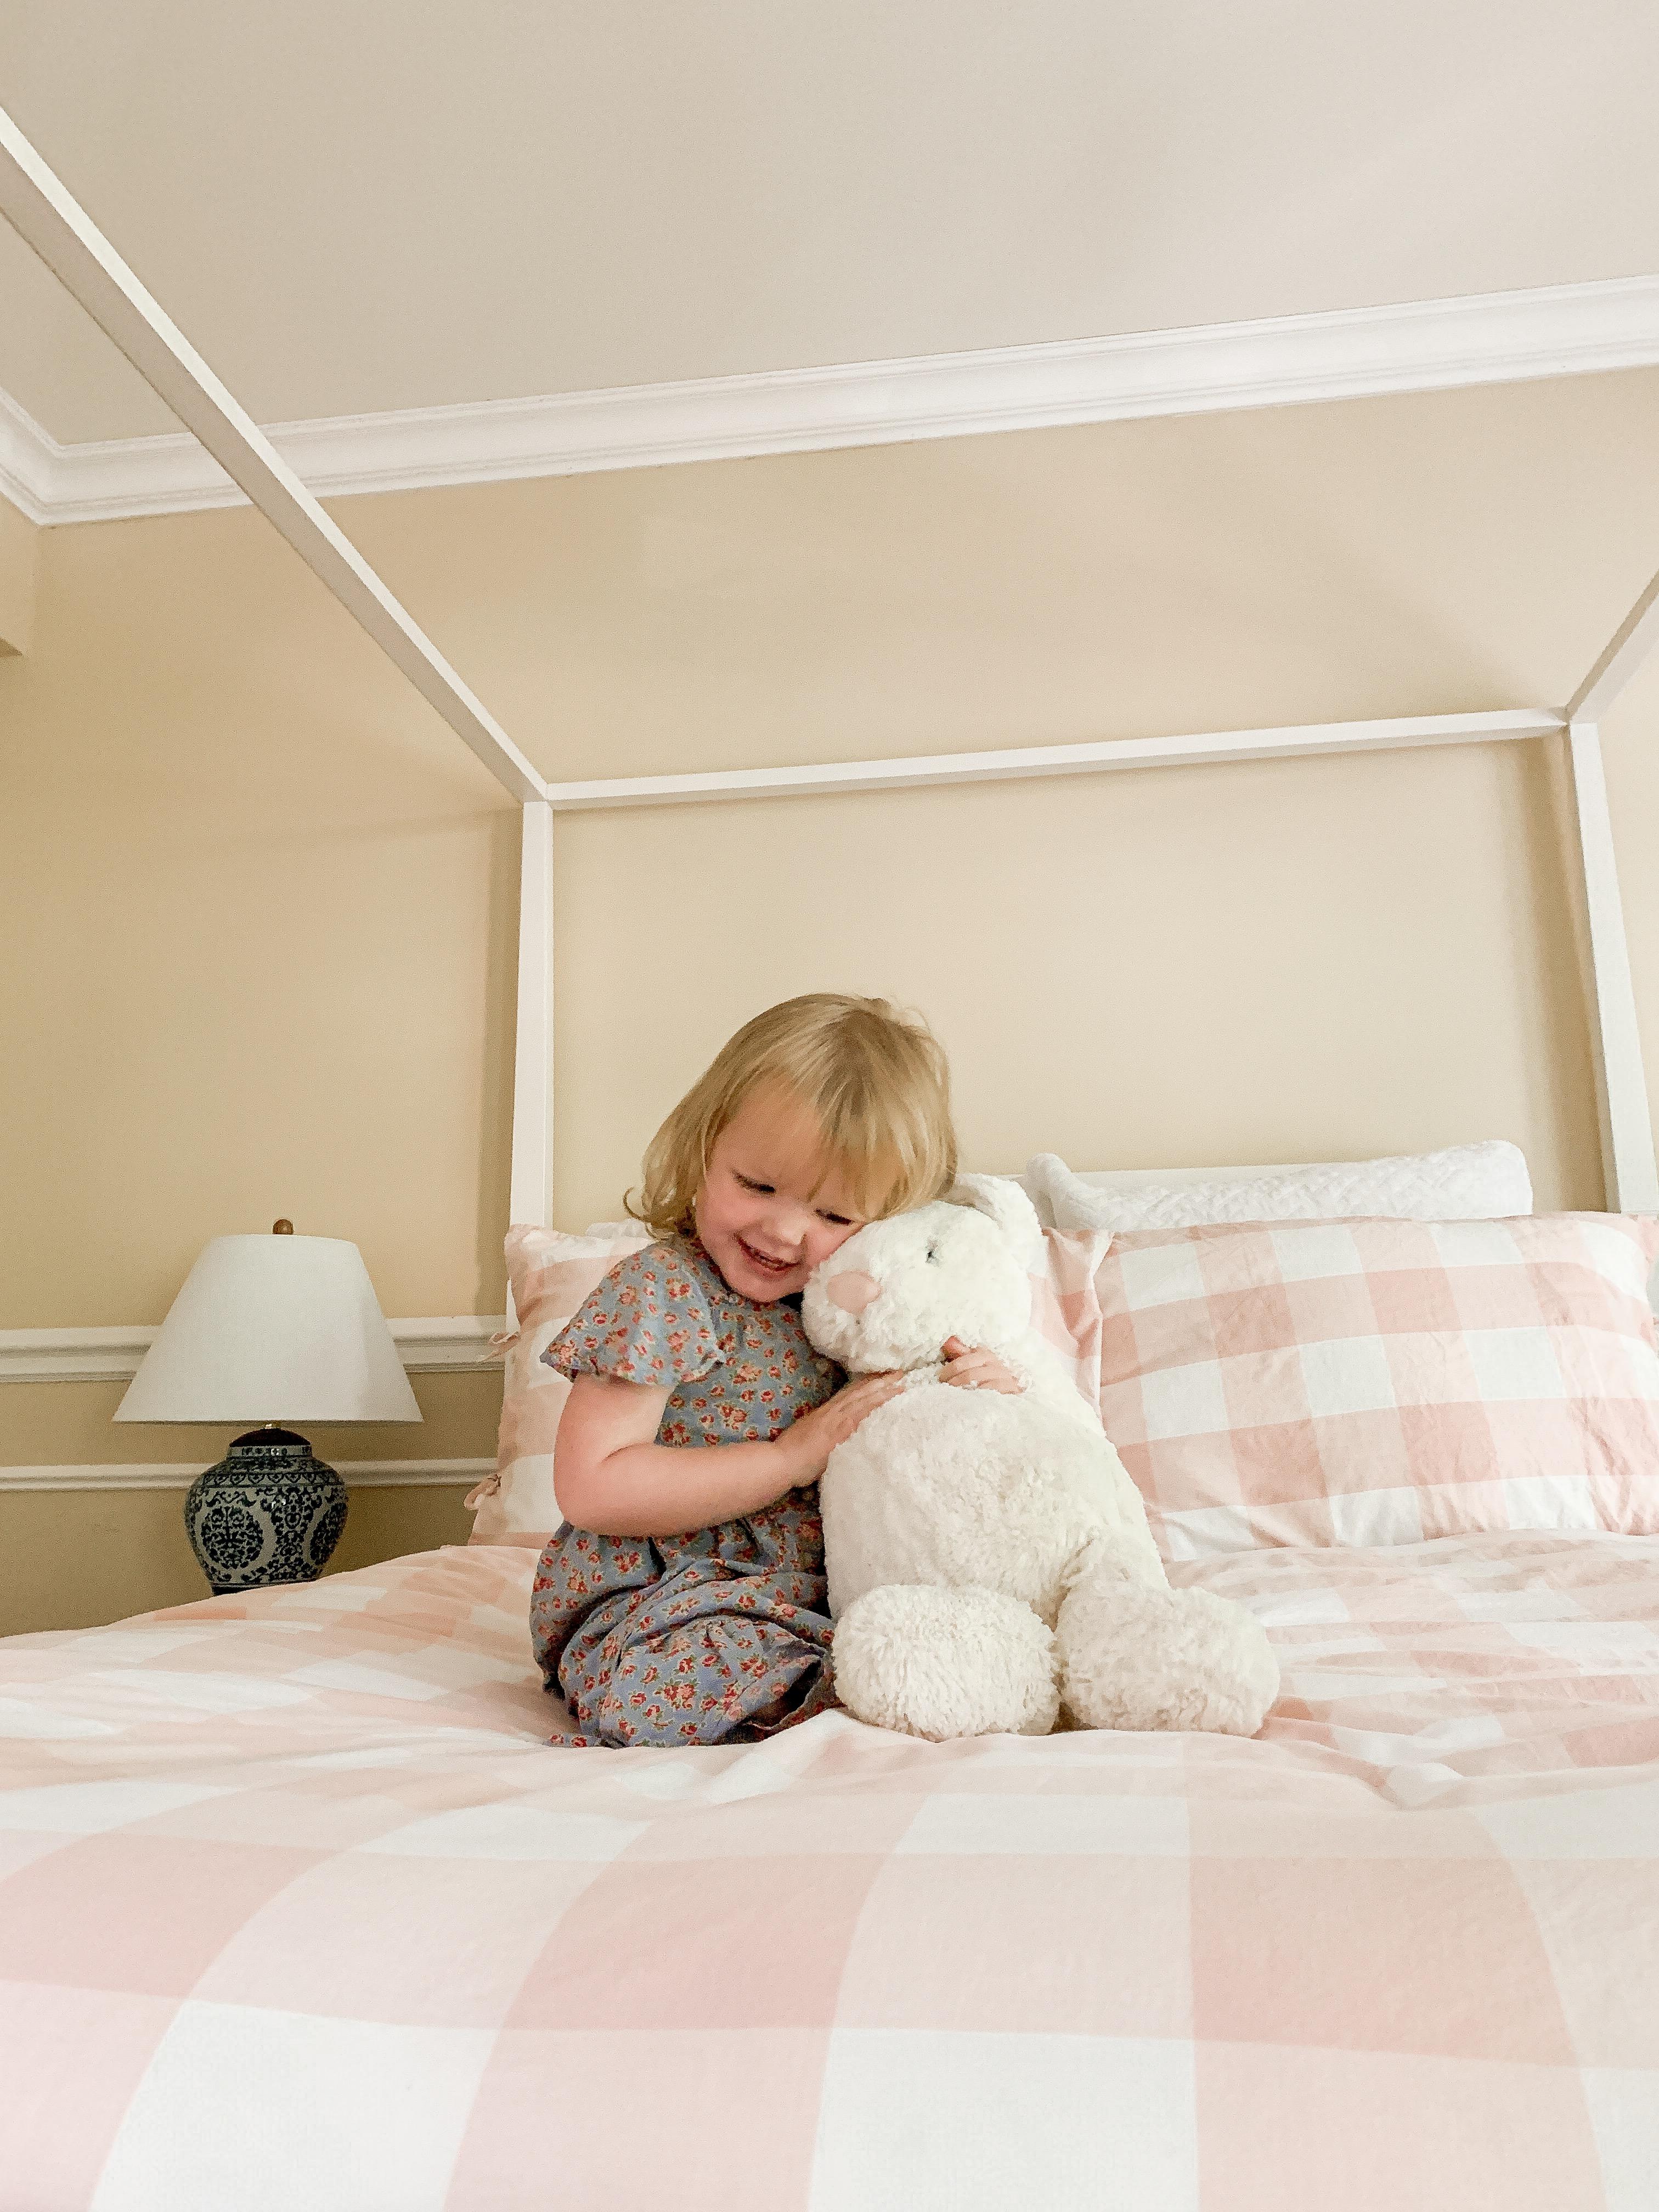 Preppy Little Girls' Room Ideas - Emma's room